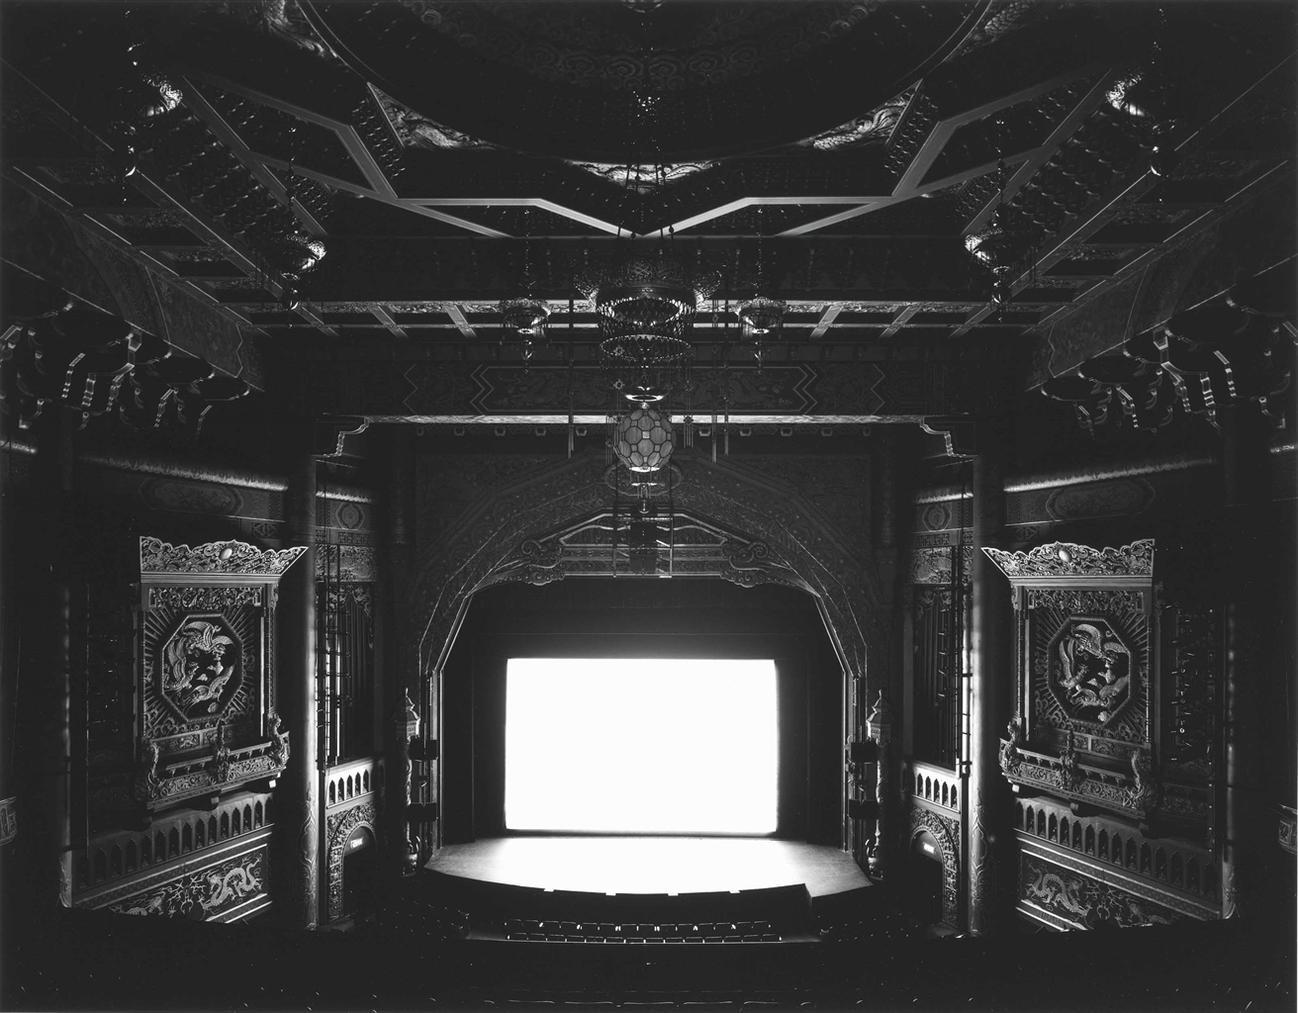 Hiroshi Sugimoto-Fifth Avenue Theatre, Seattle-1997